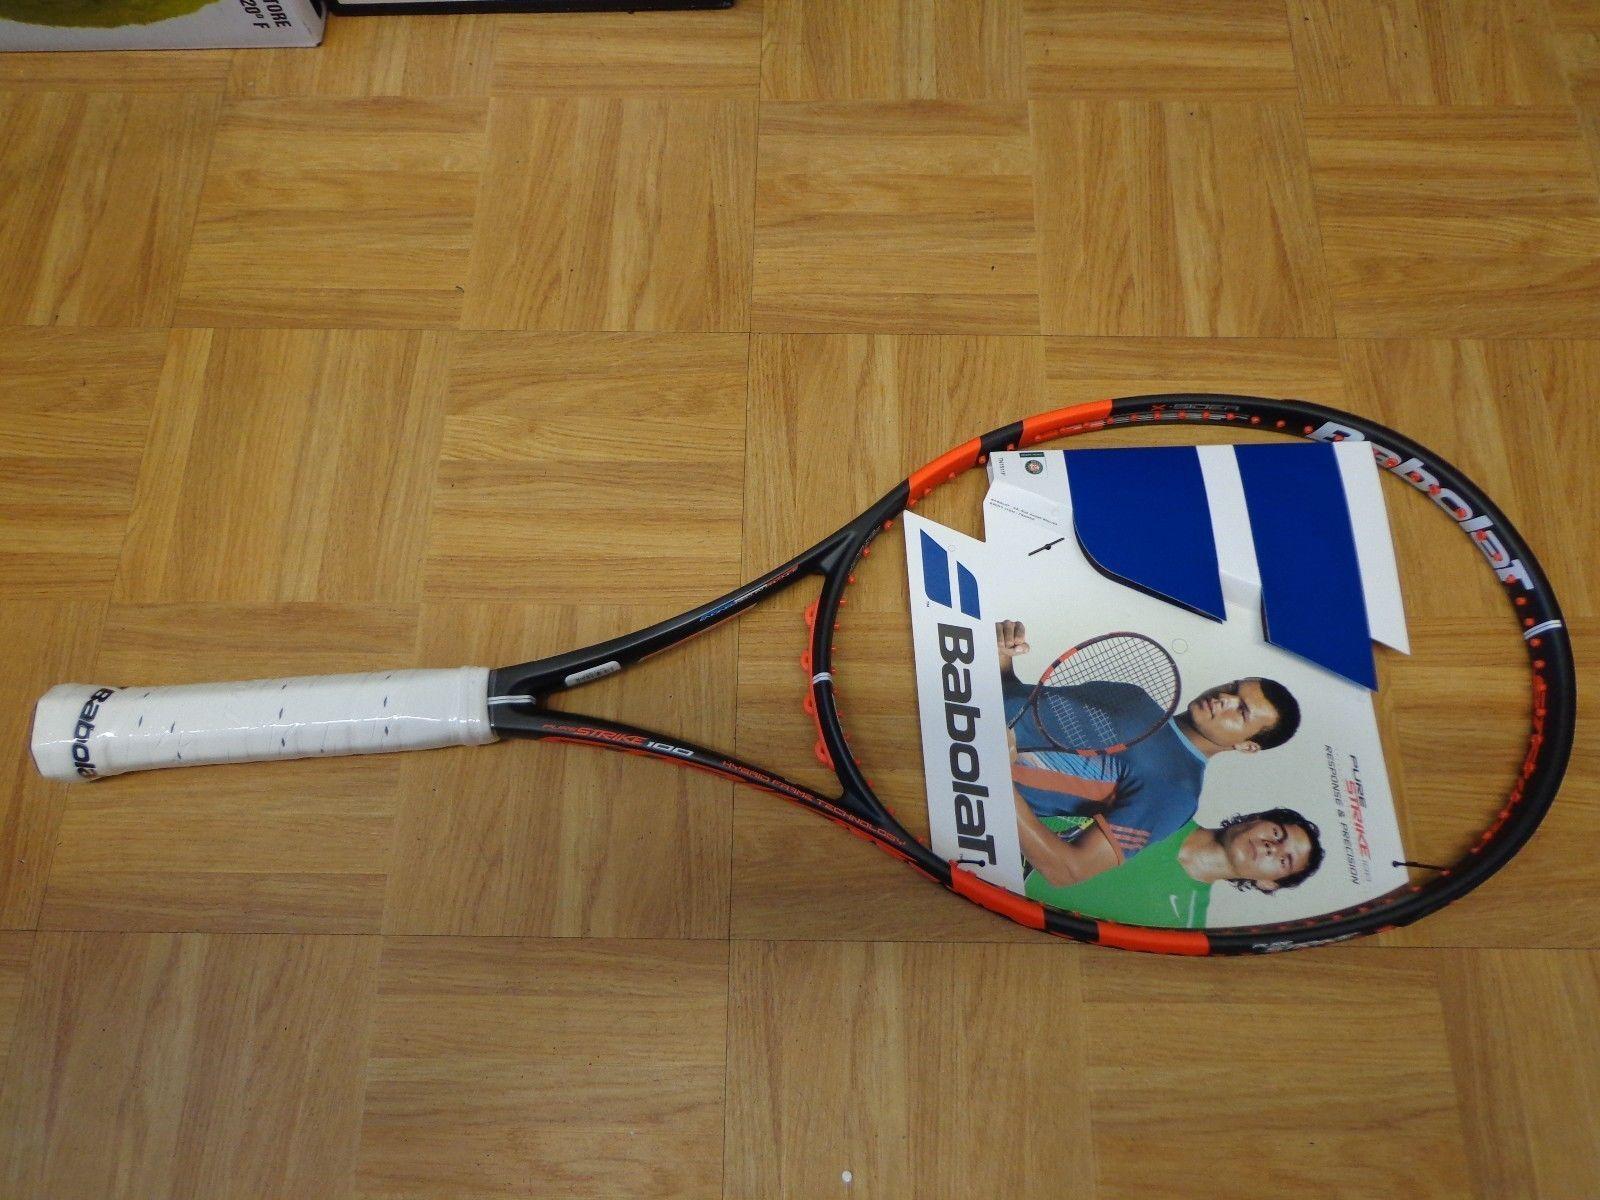 Nuevo 2015 Babolat Pure Strike 100 cabeza 16x19 4 1 4 Grip Tenis Raqueta